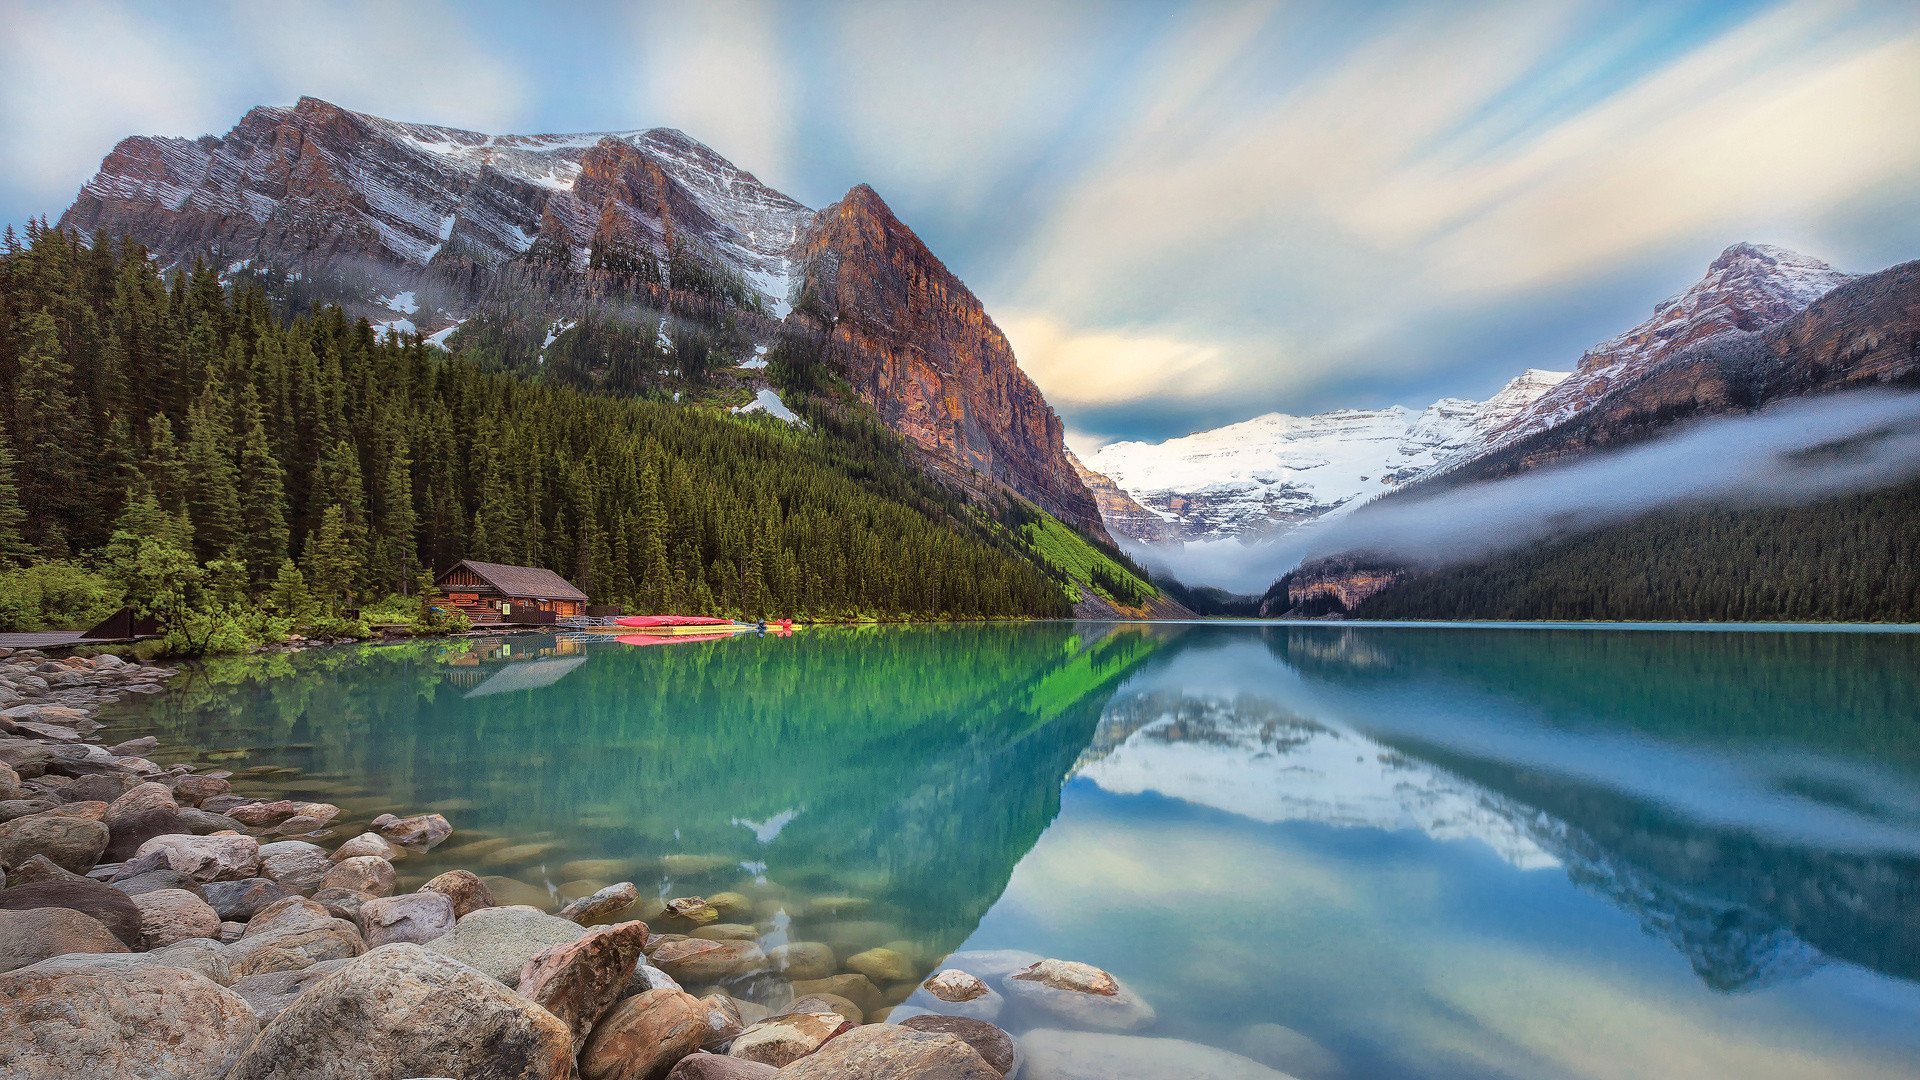 Lake Louise Canada 17135 Hd Wallpaper